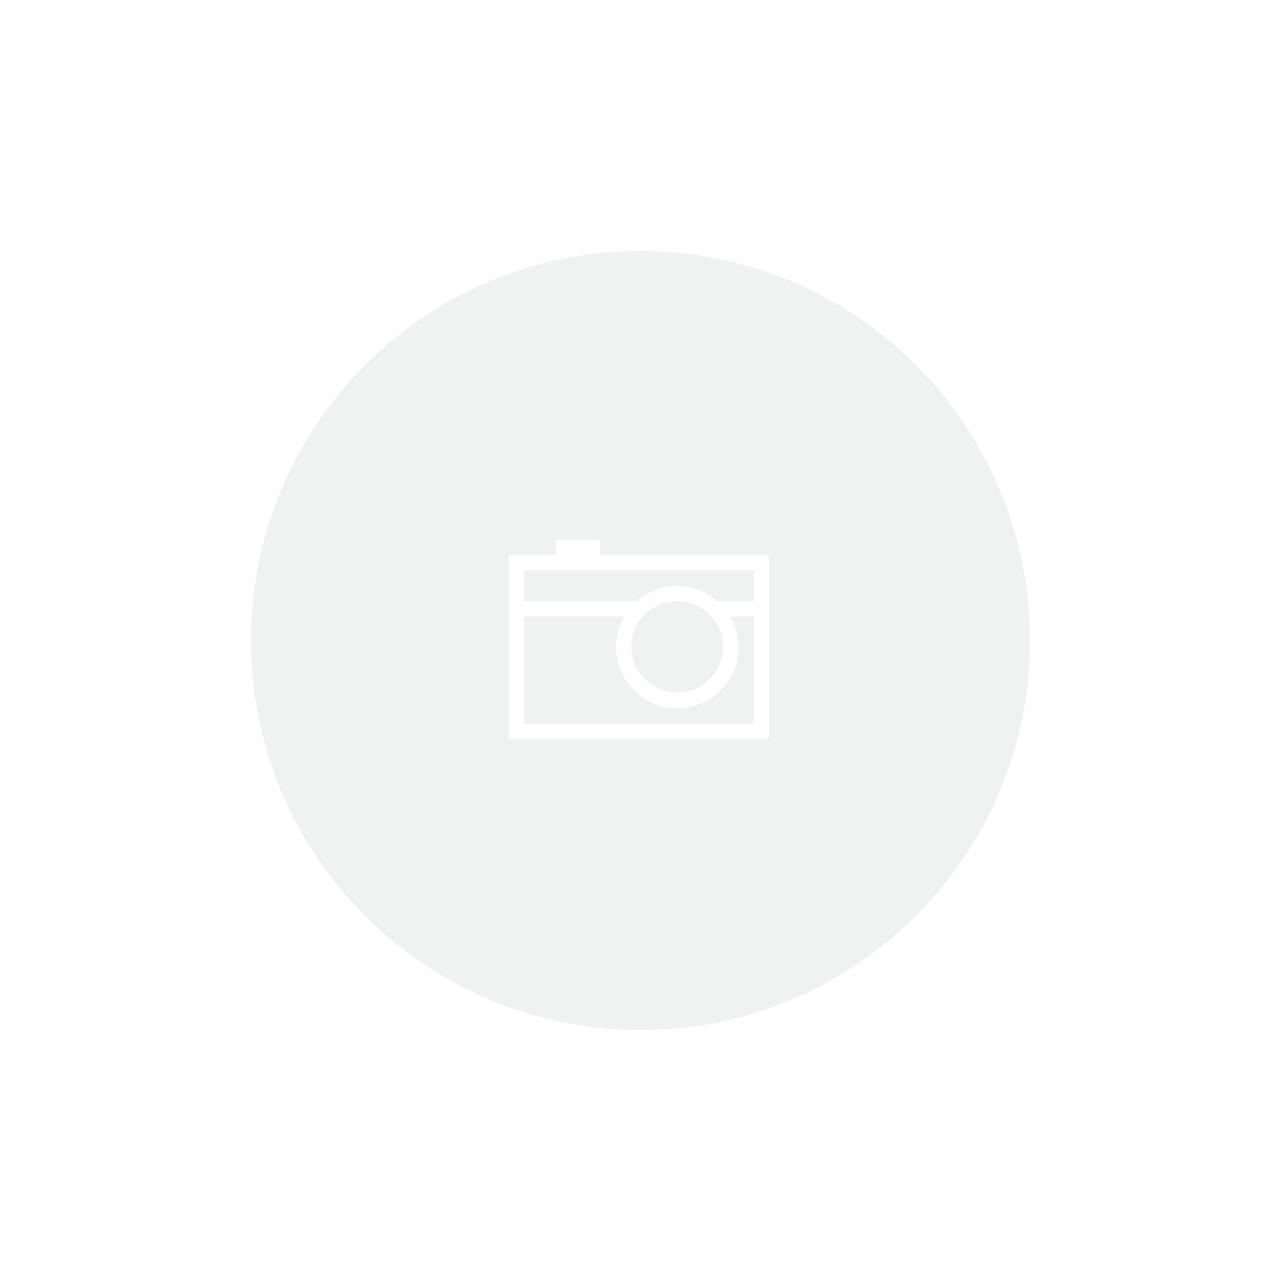 Cesta 34x24x12cm Poliester Branco com Bege